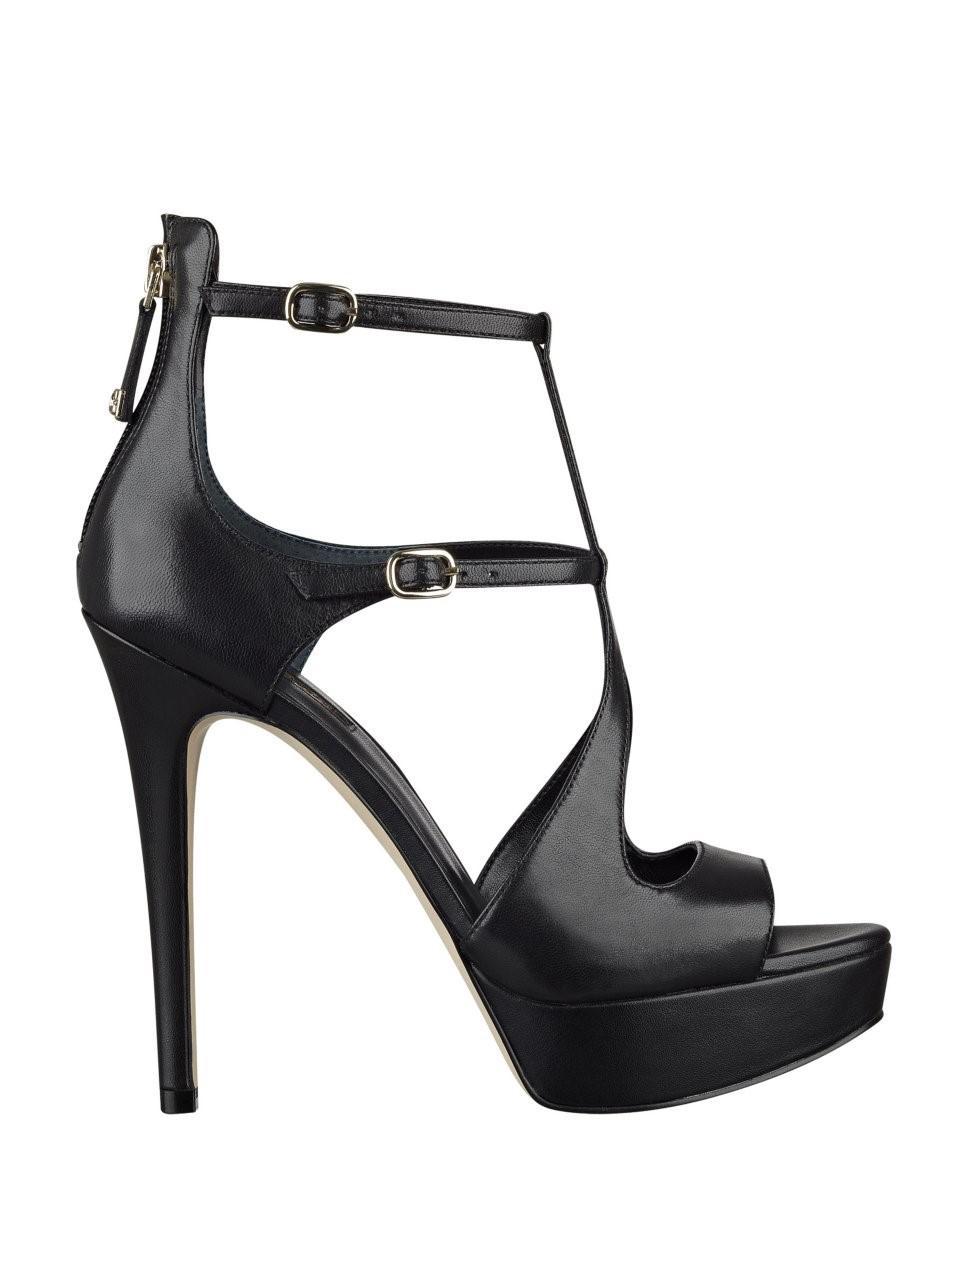 d4a93e192a2c2 Lyst - Guess Kymora Platform Heels in Black